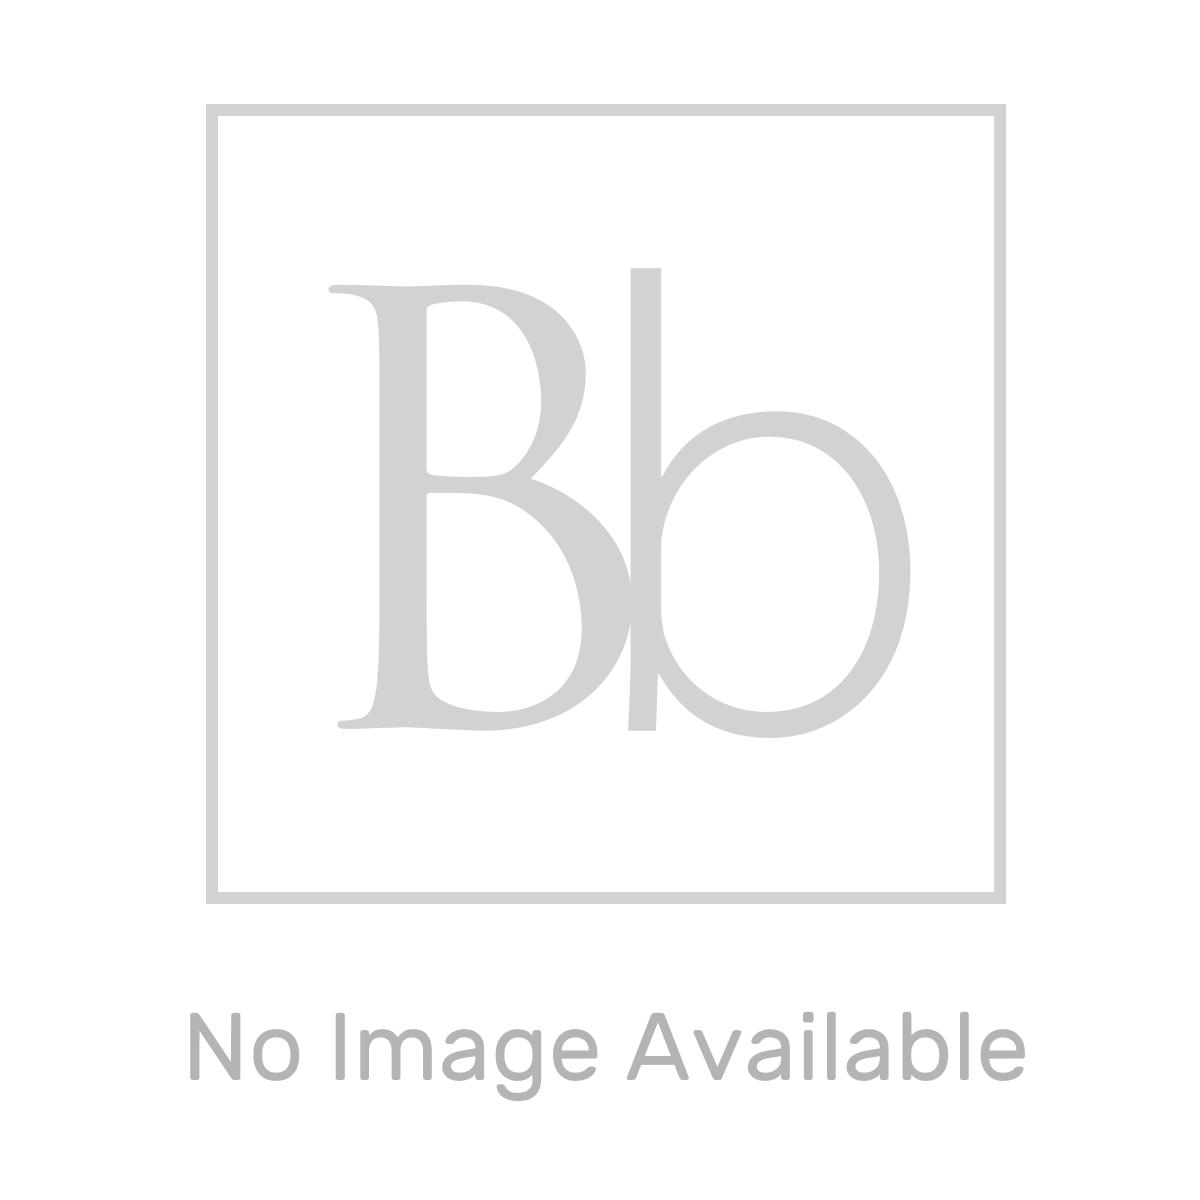 RAK Maremma Copper Matt Tile 600 x 1200mm Lifestyle